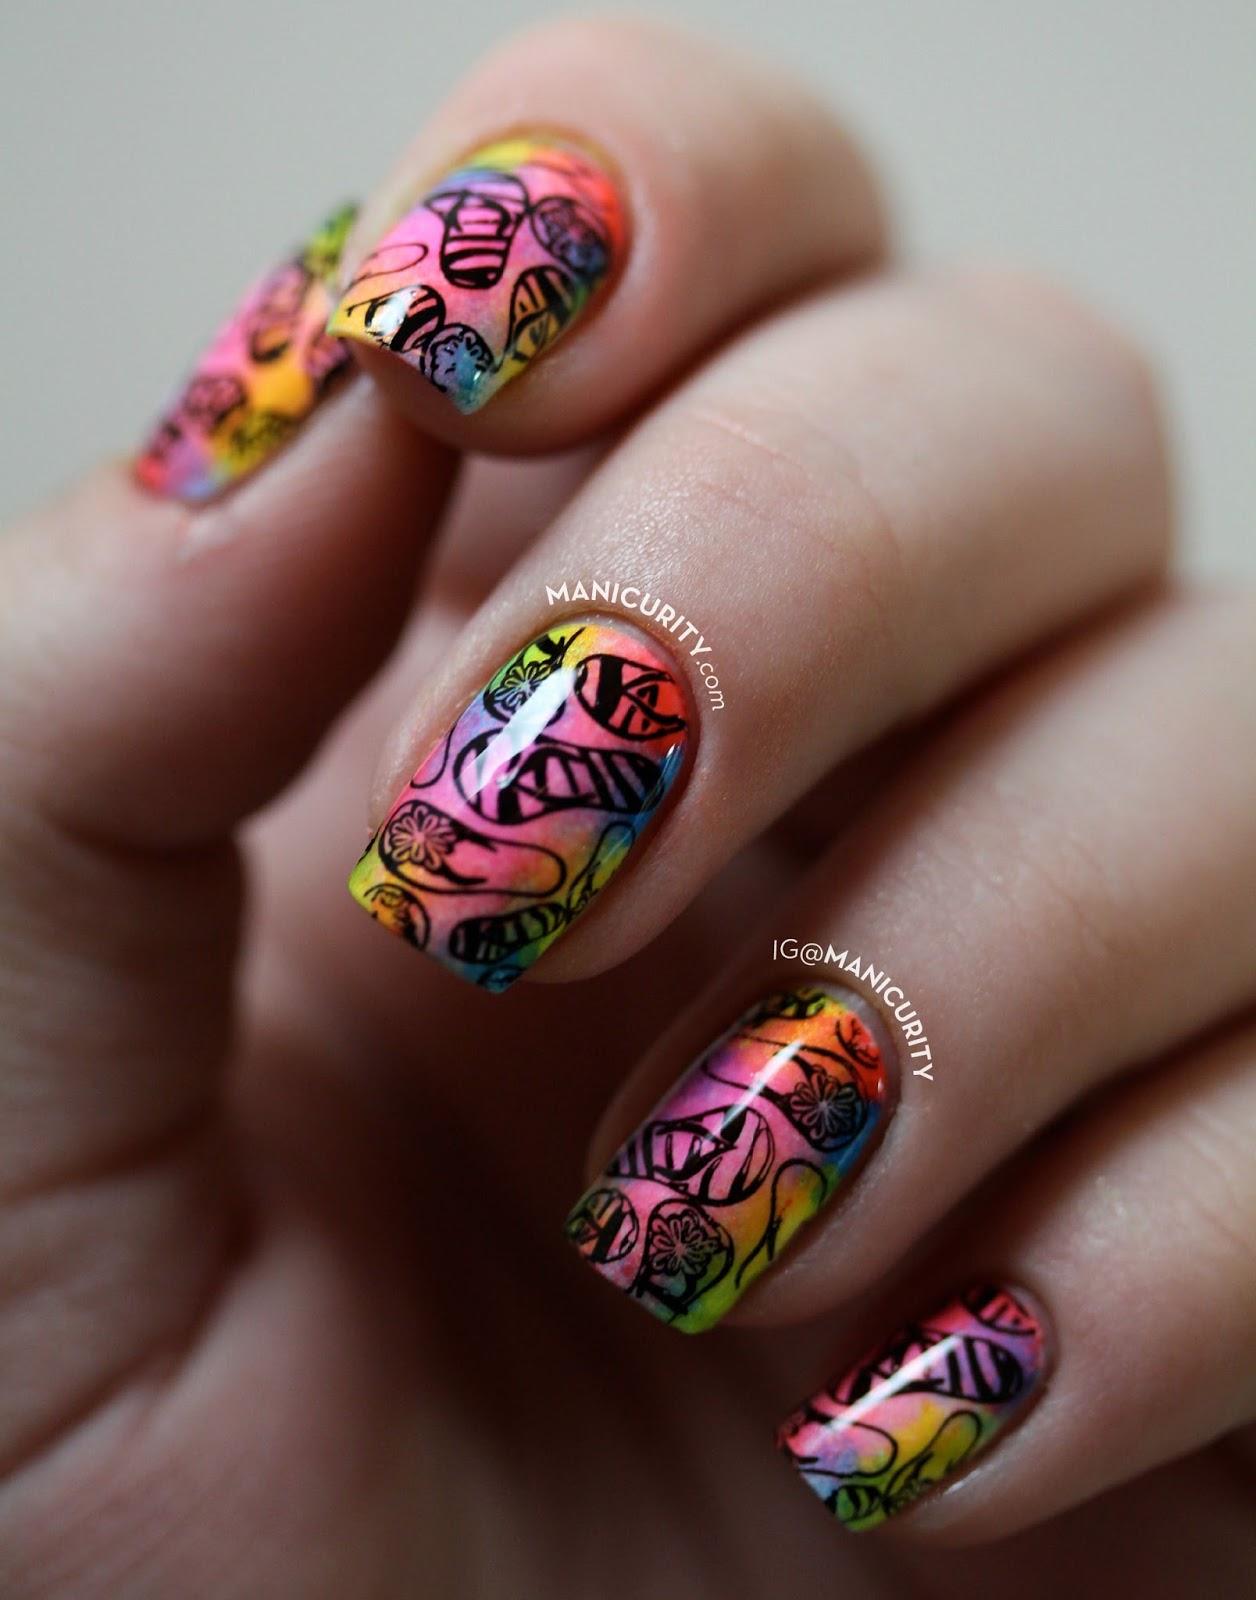 The Digit-al Dozen: Soft Tie Dye Neon Flip Flop Nail Art - inspired by neon summer pedicures! | Manicurity.com @emmathea